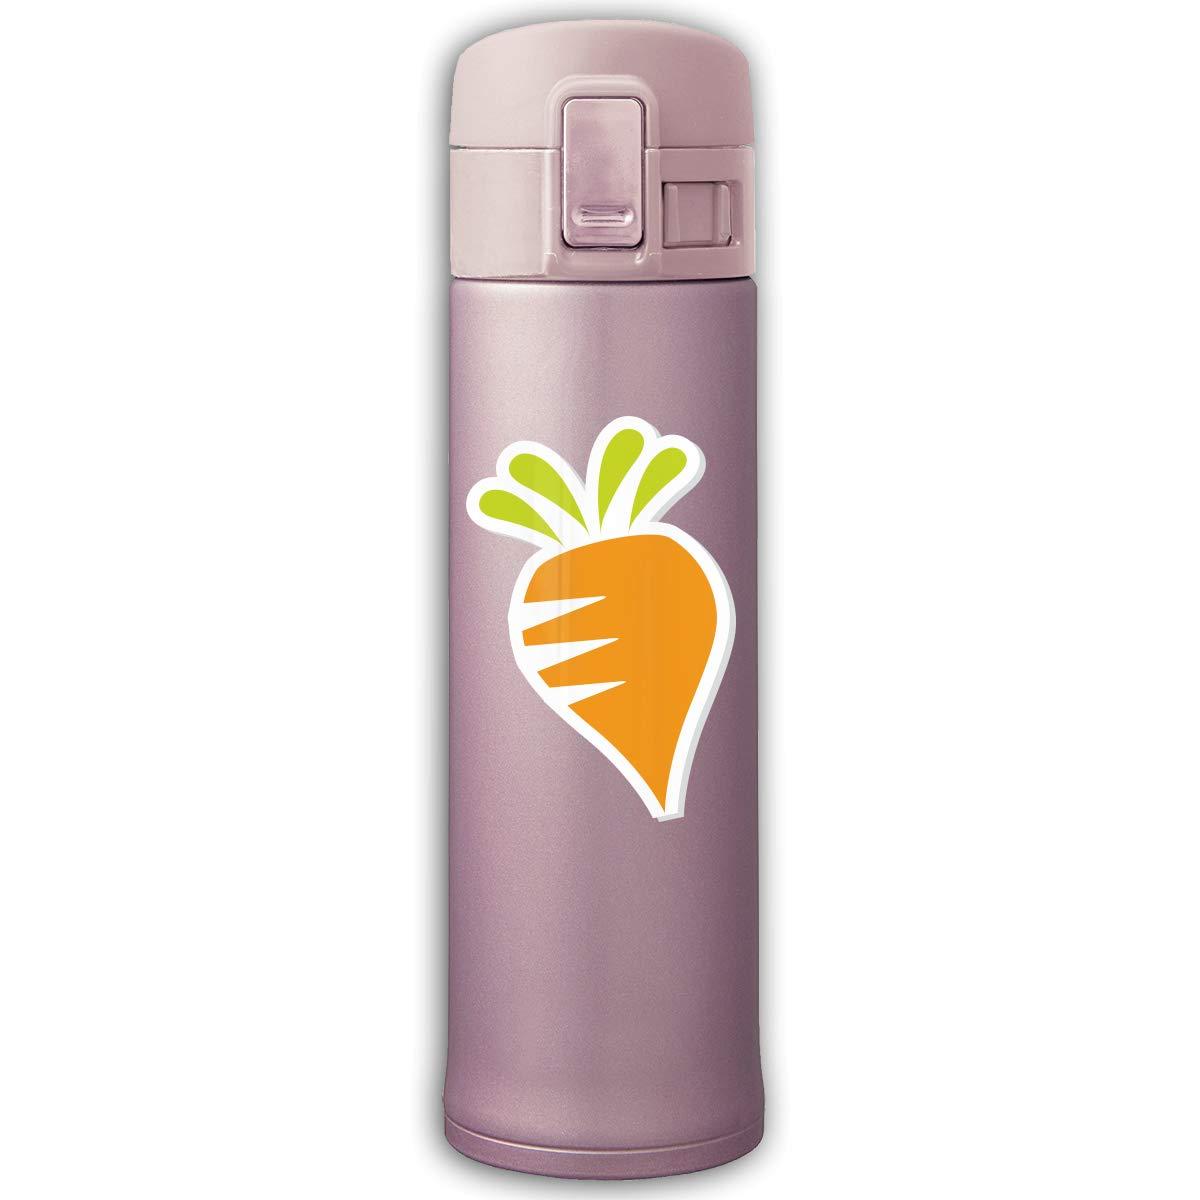 Amazon.com: Cartoon lovely Minions cute cell phone case for ...